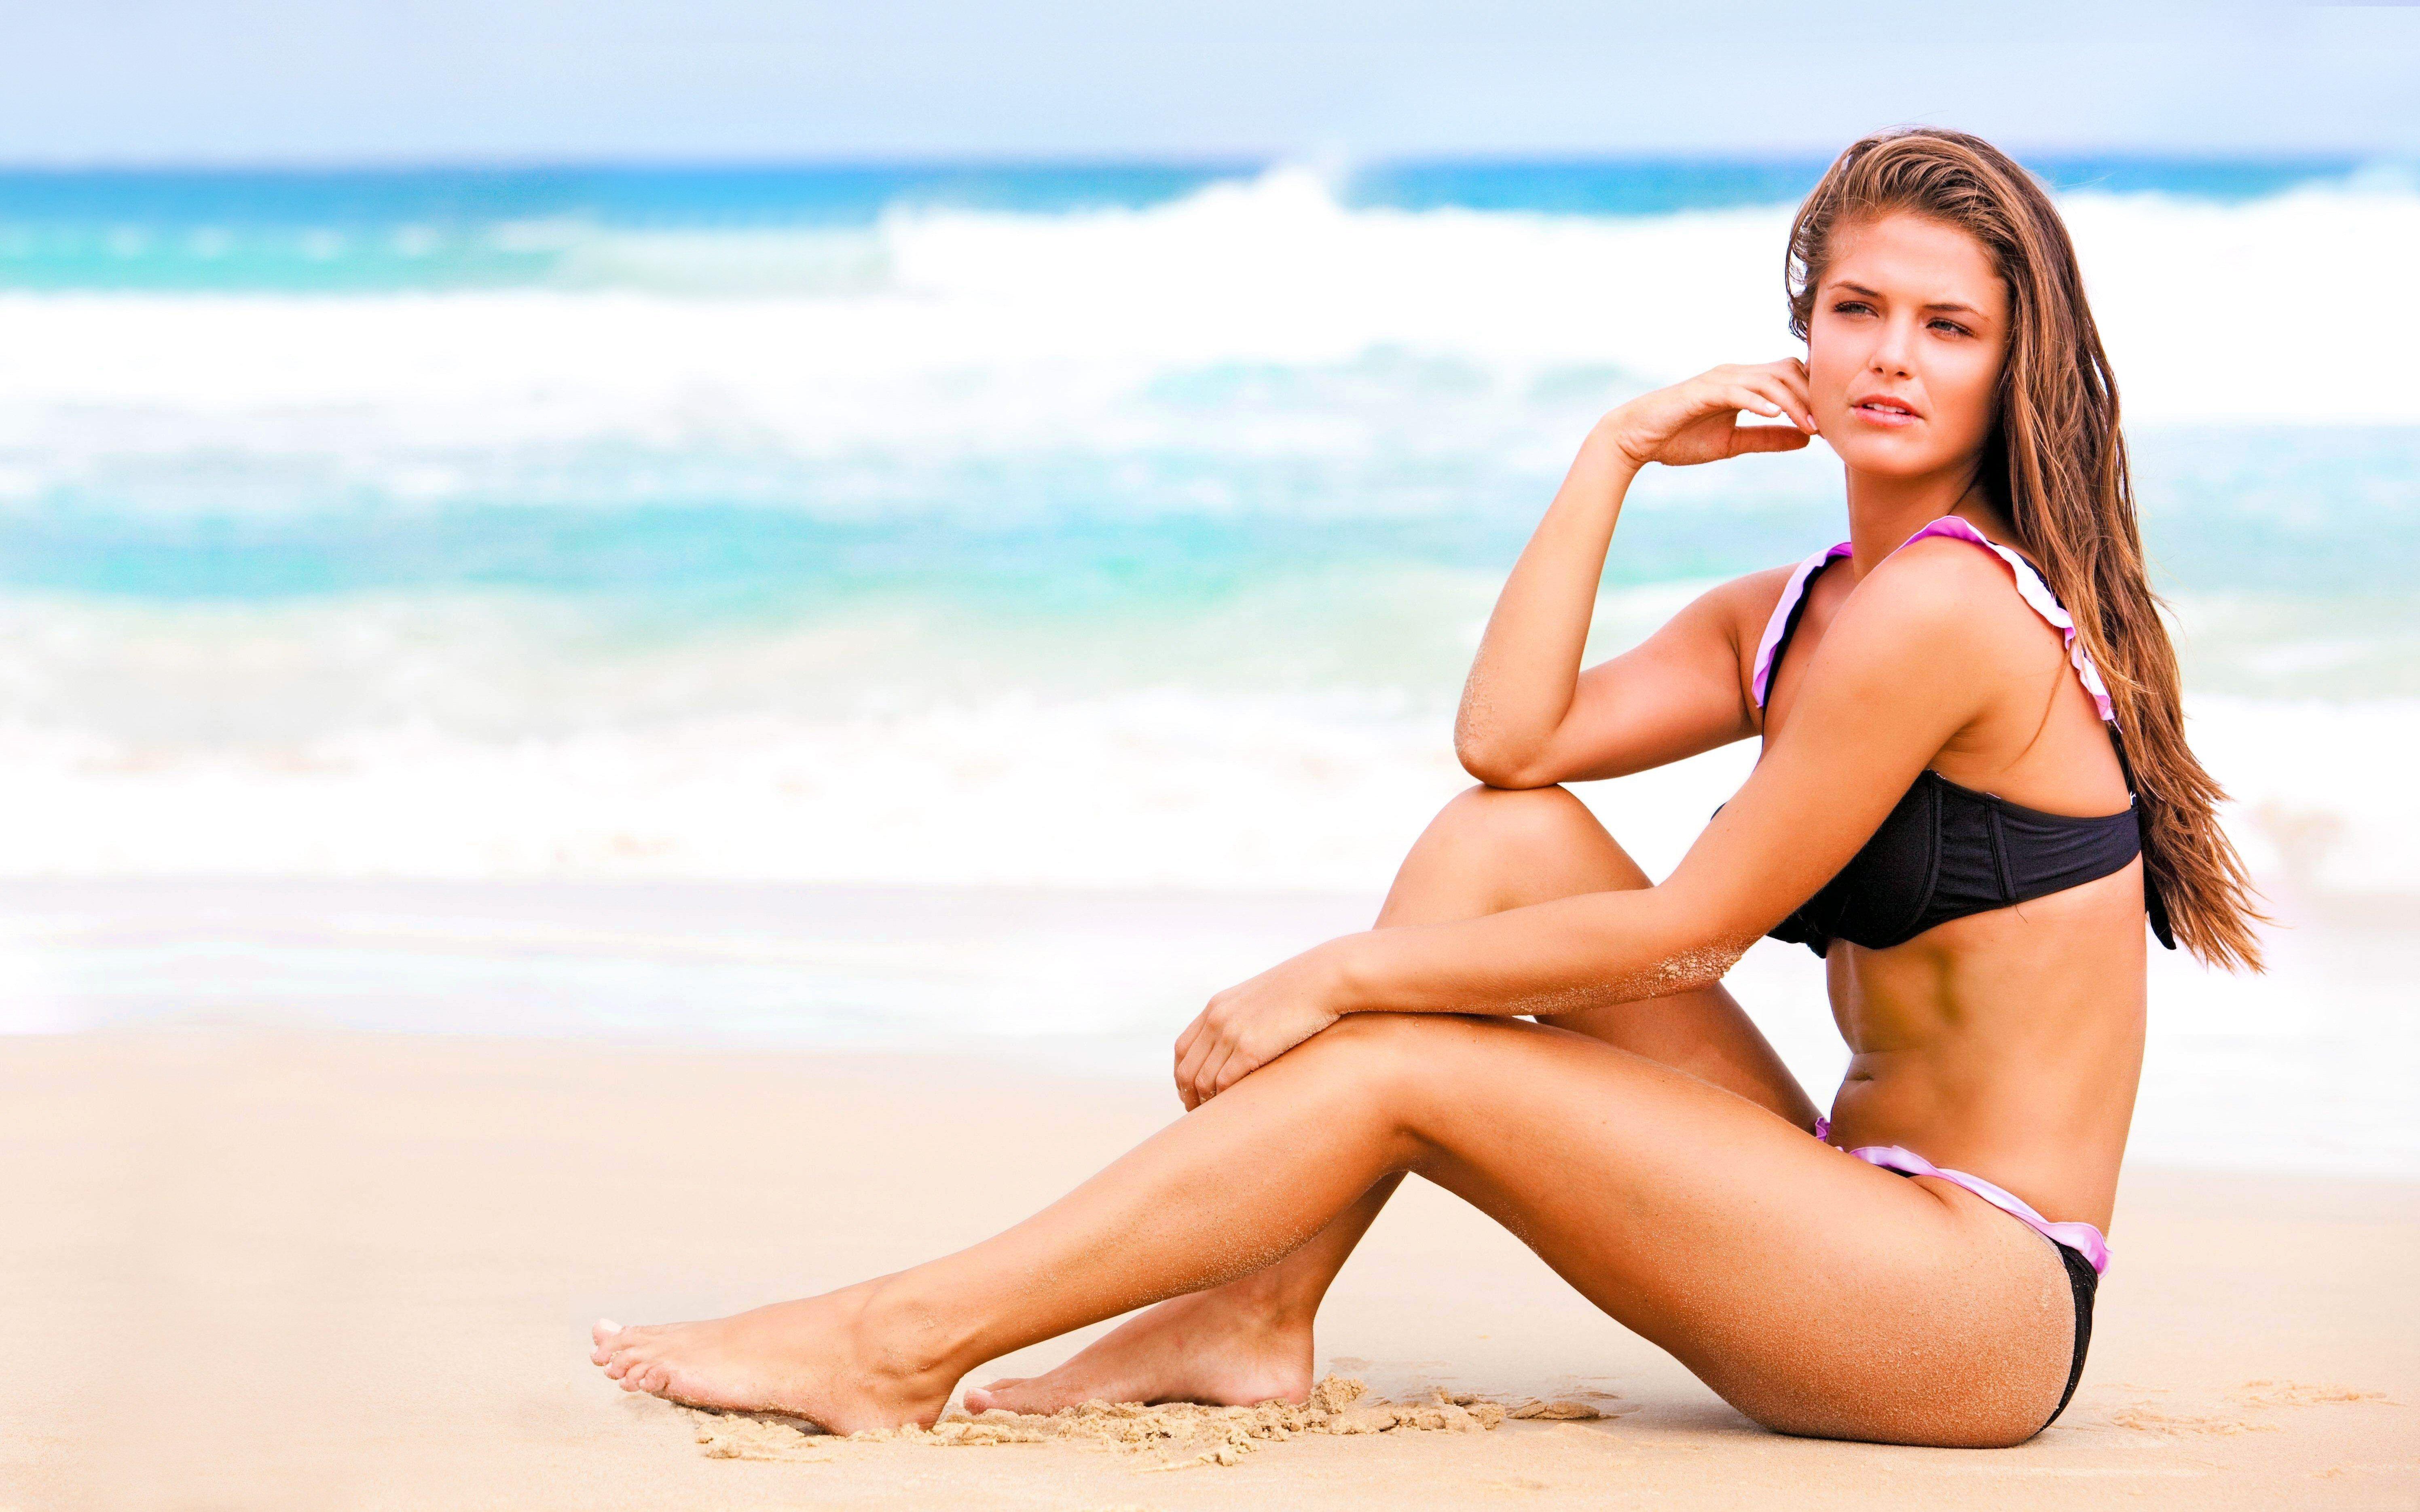 Картинки девушек в на пляже